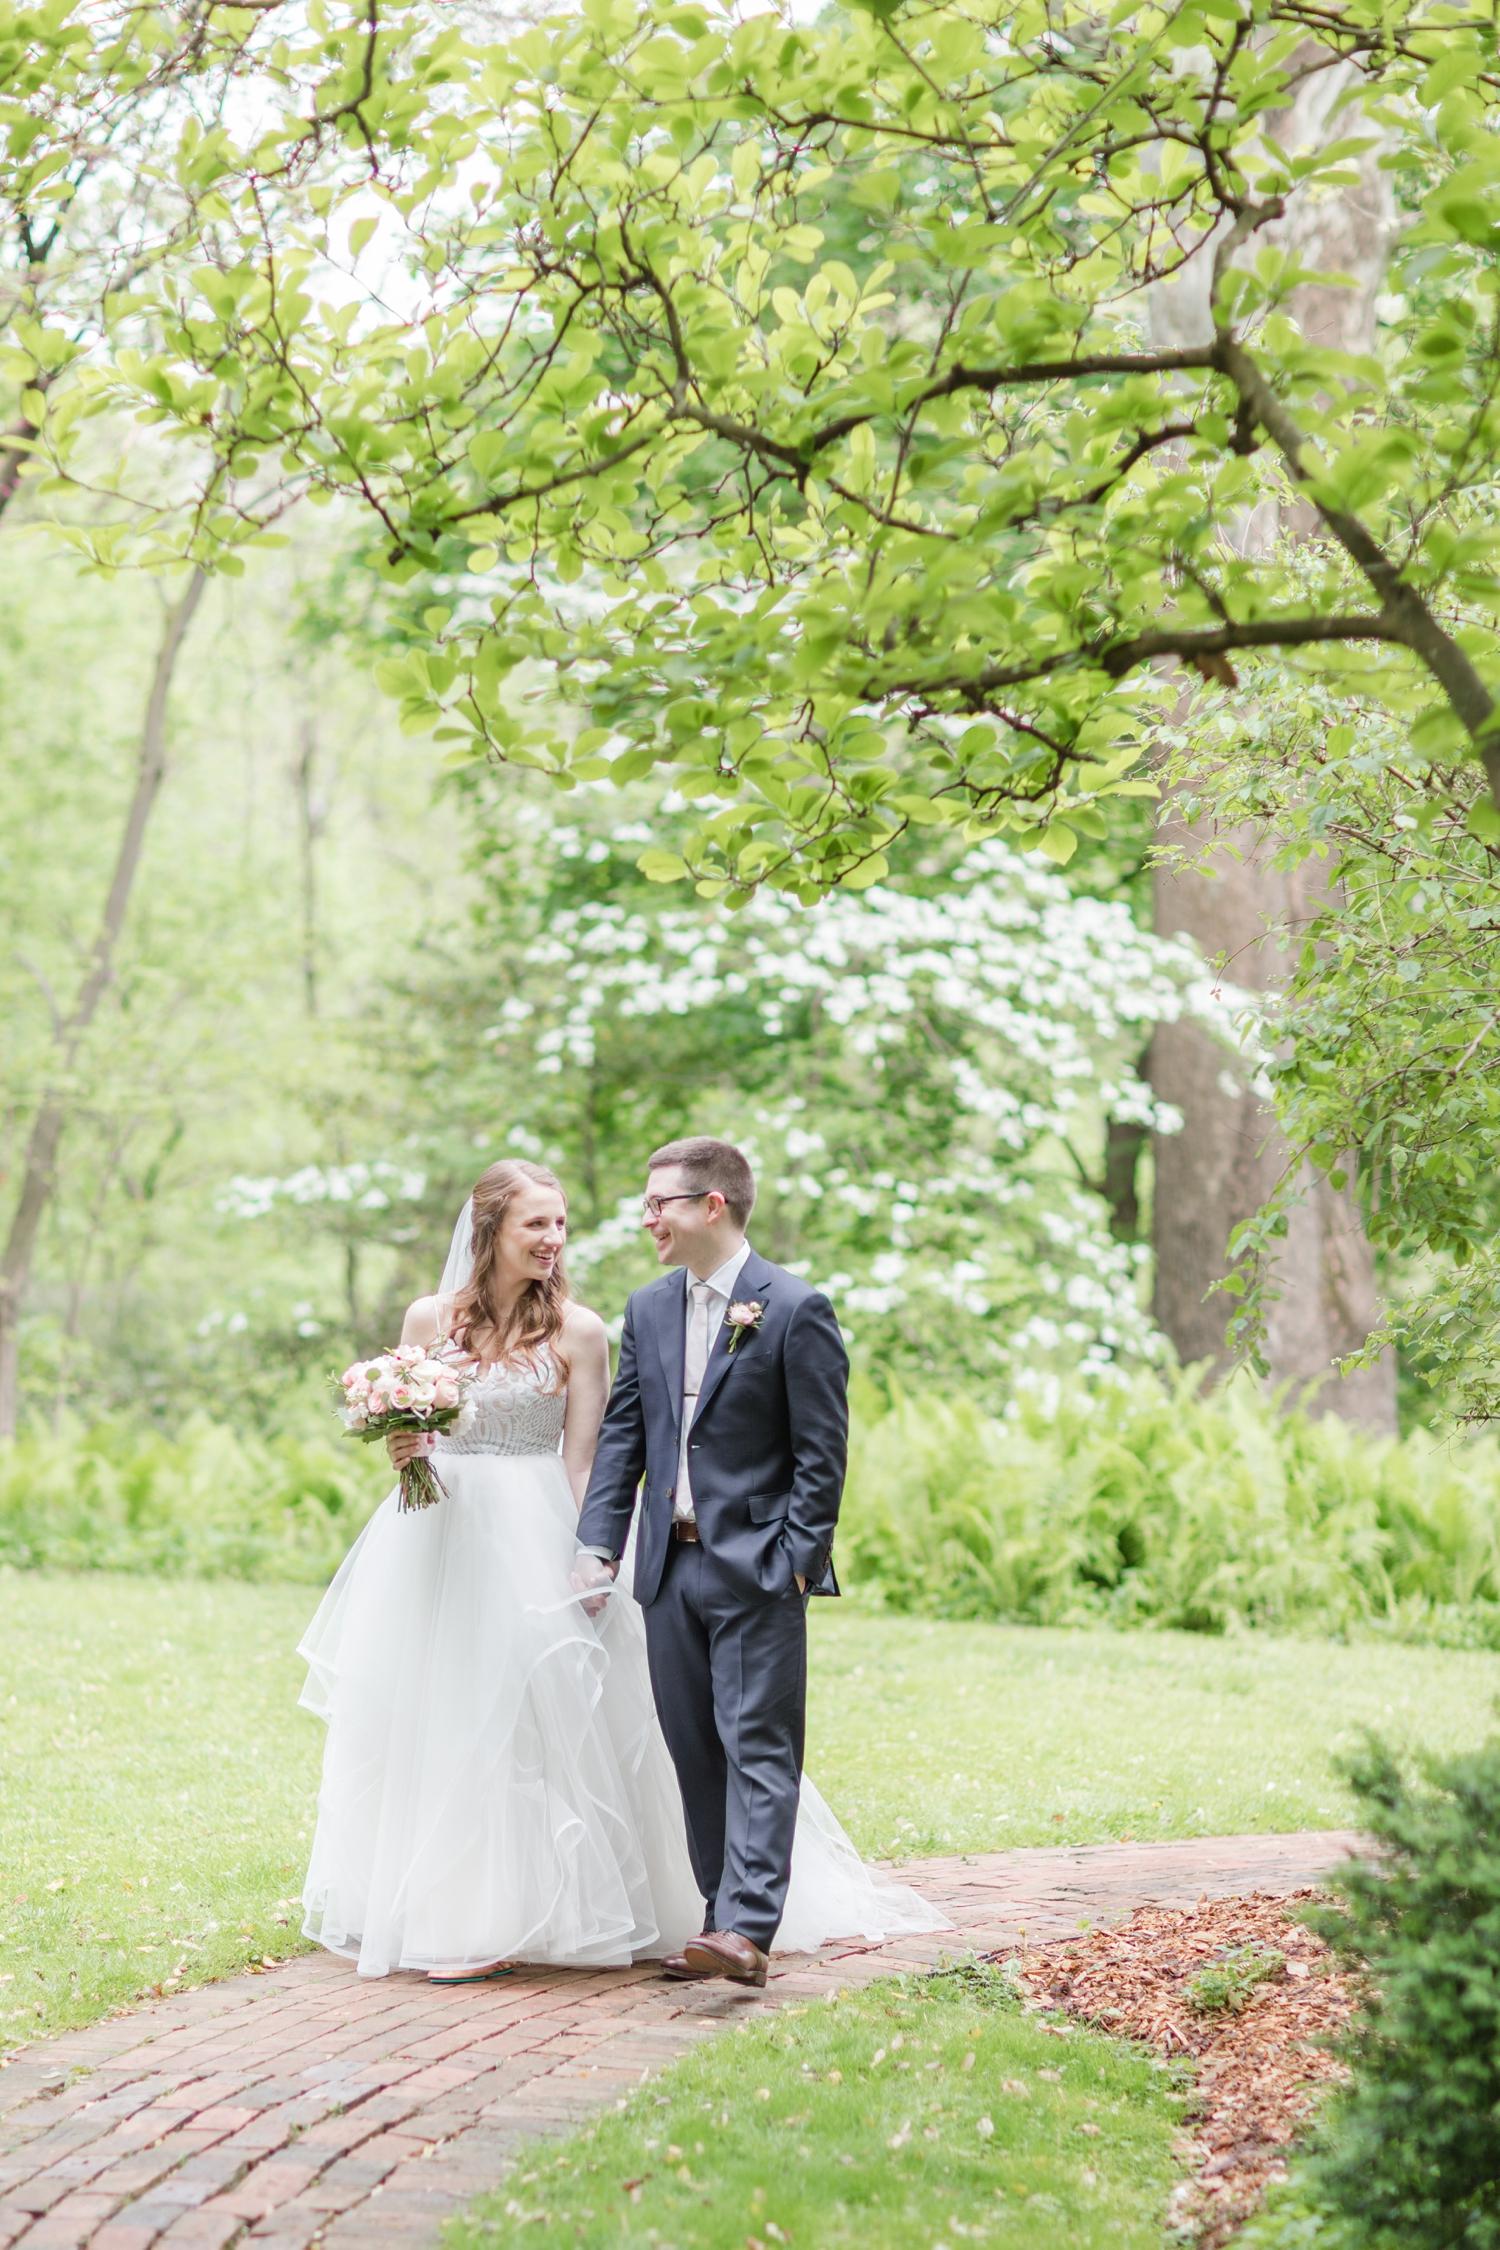 Hildebrand WEDDING HIGHLIGHTS-169_Elkridge-Furnace-Inn-wedding-Maryland-wedding-photographer-anna-grace-photography-photo.jpg